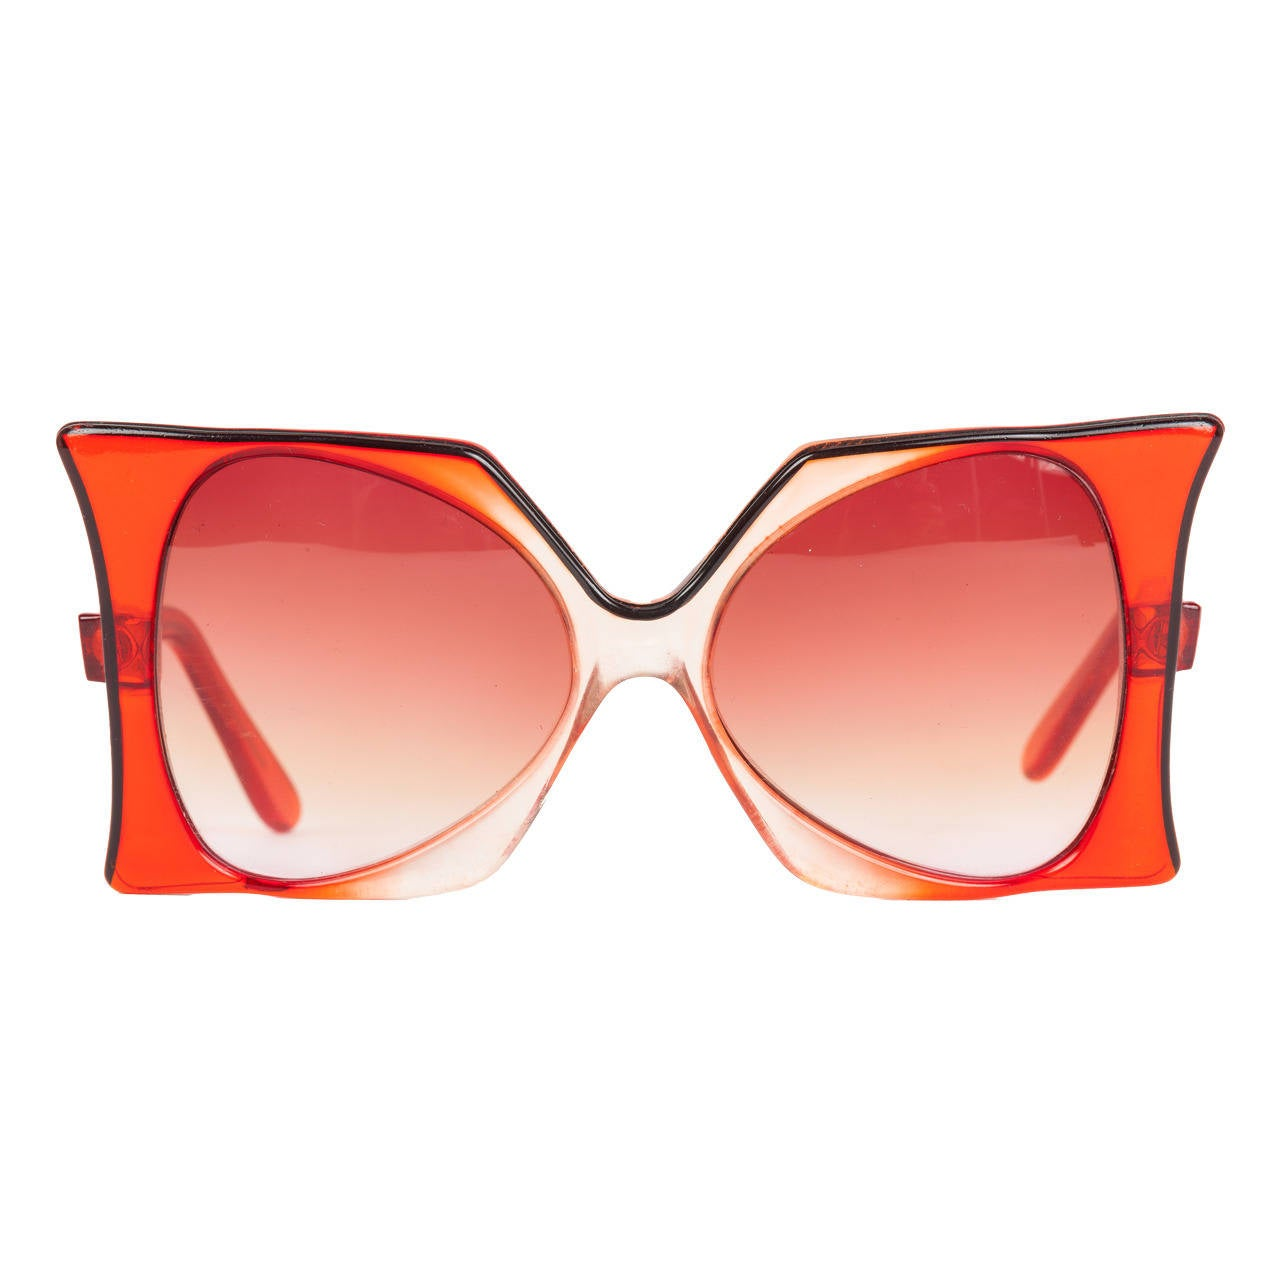 "1960's Iconic Pierre Cardin Oversize Red ""Delphine"" Sunglasses 1"